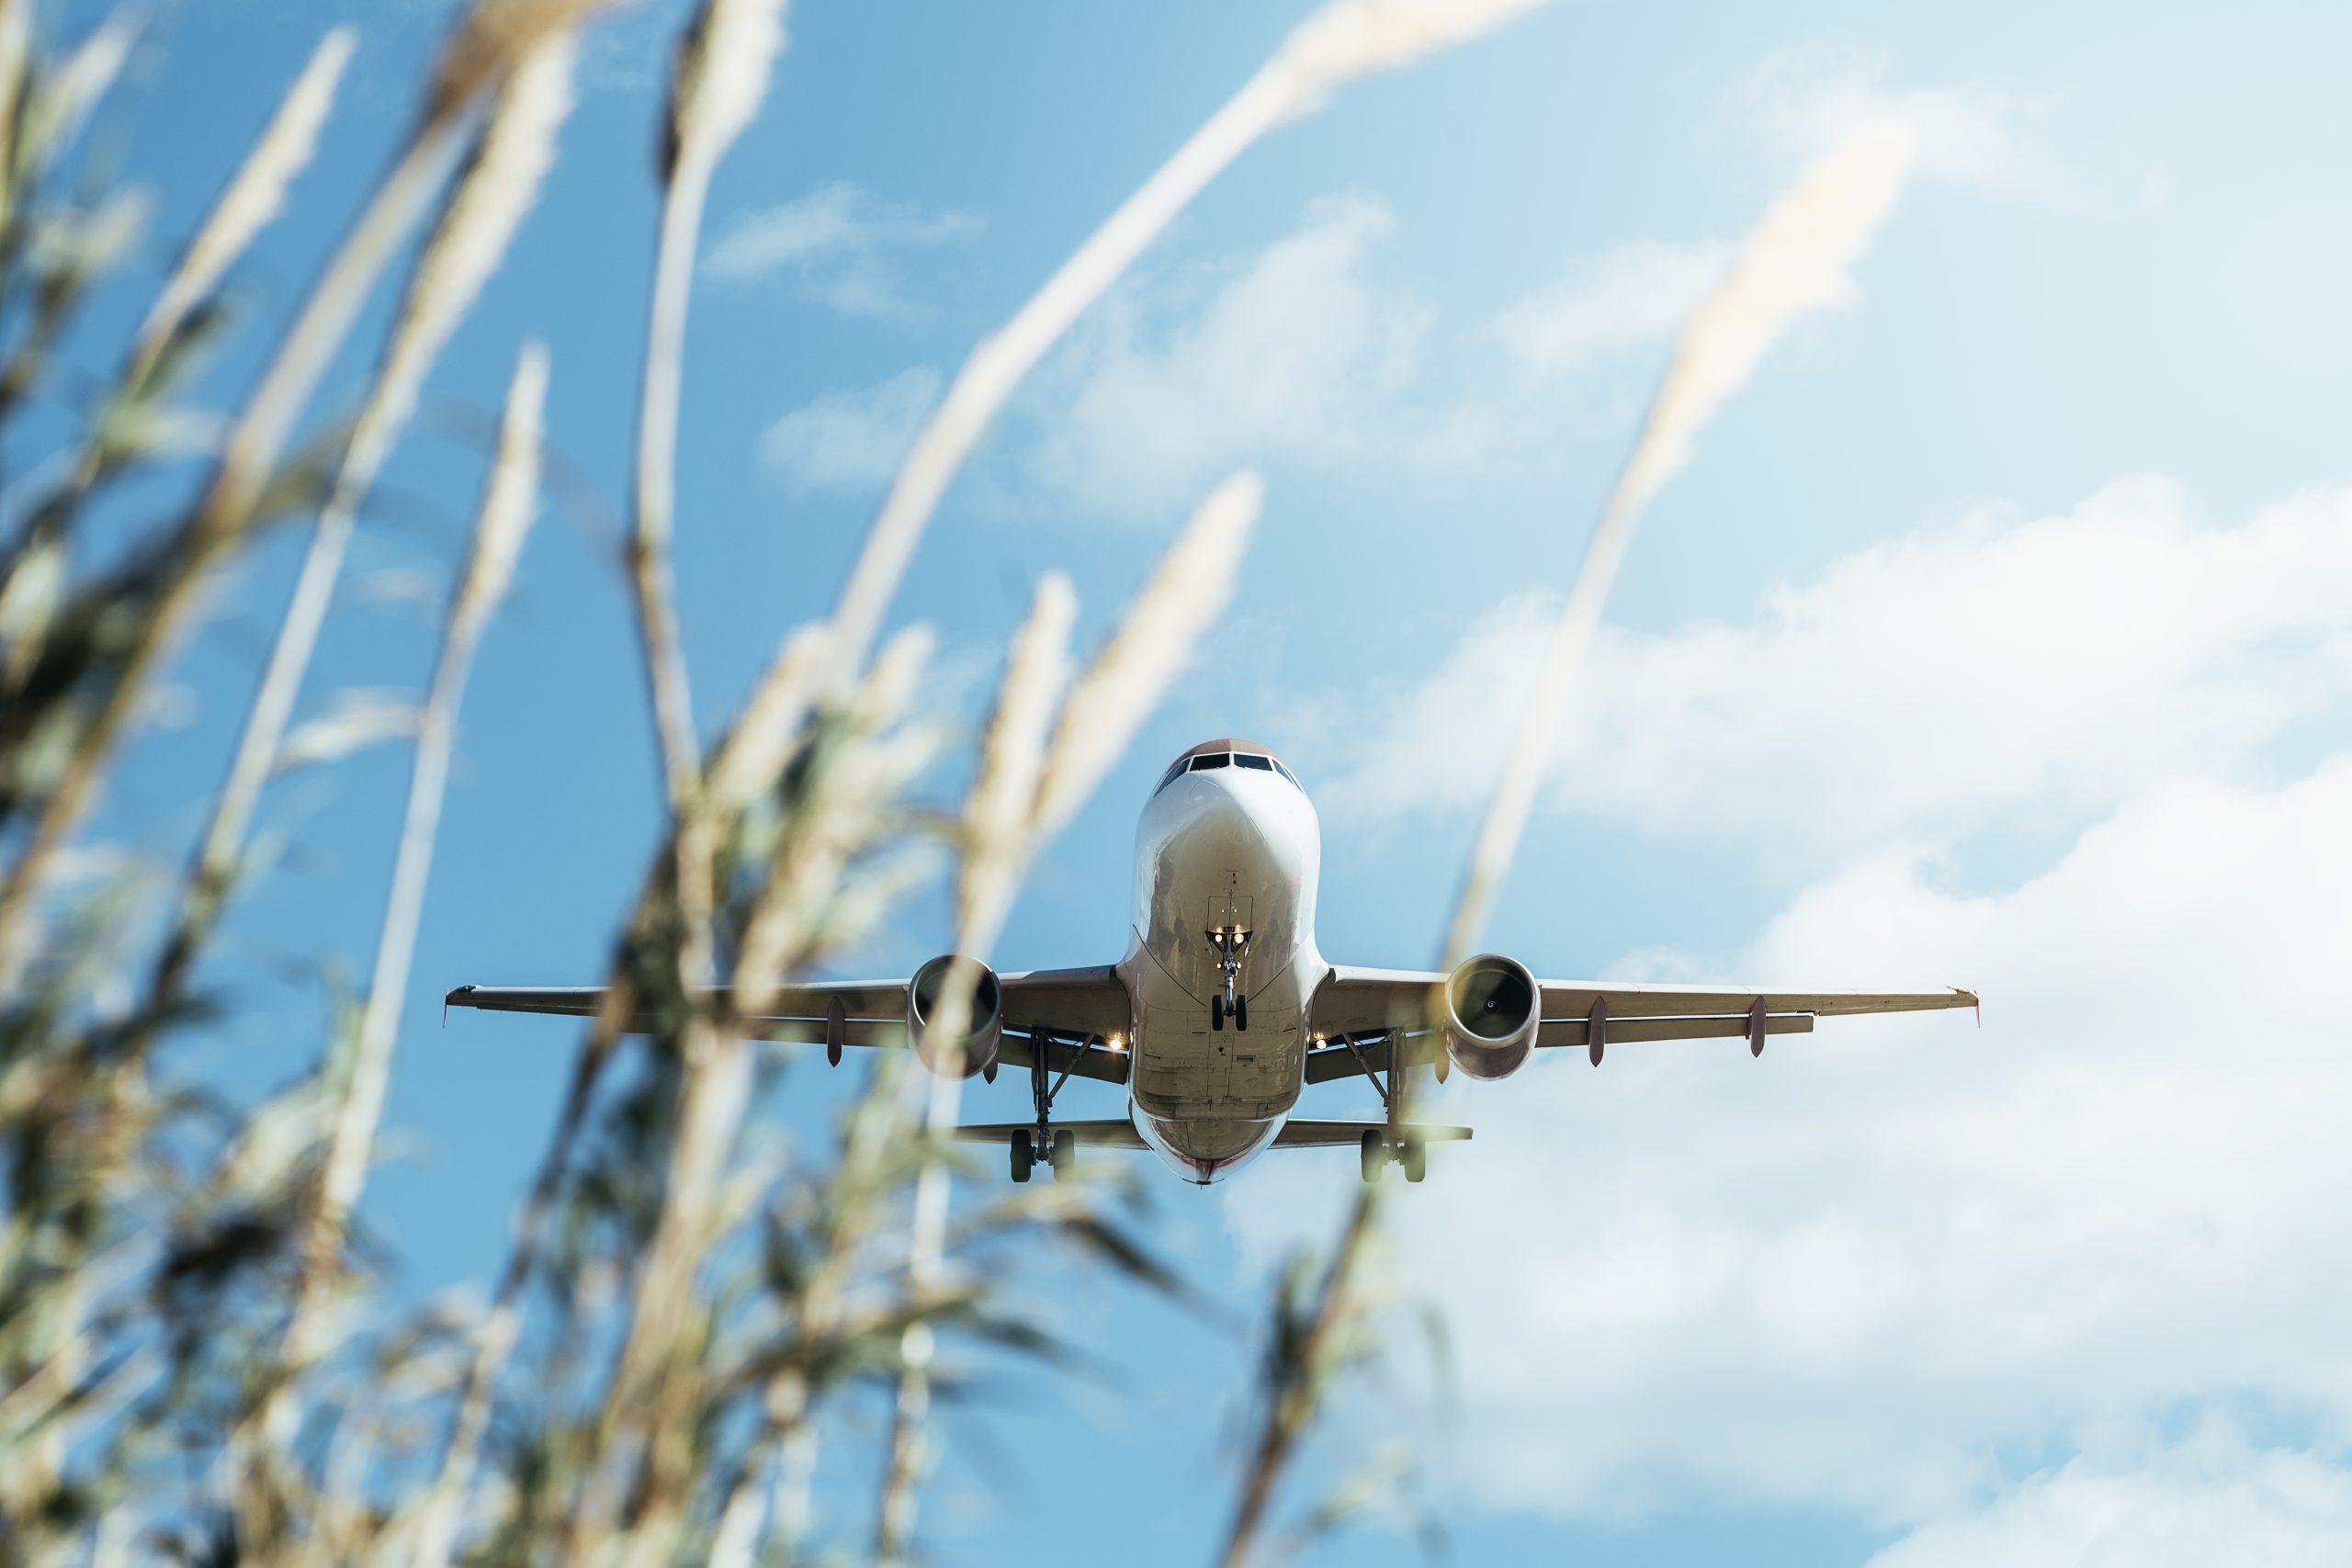 umweltfreundlicheres Flugzeug im Anflug